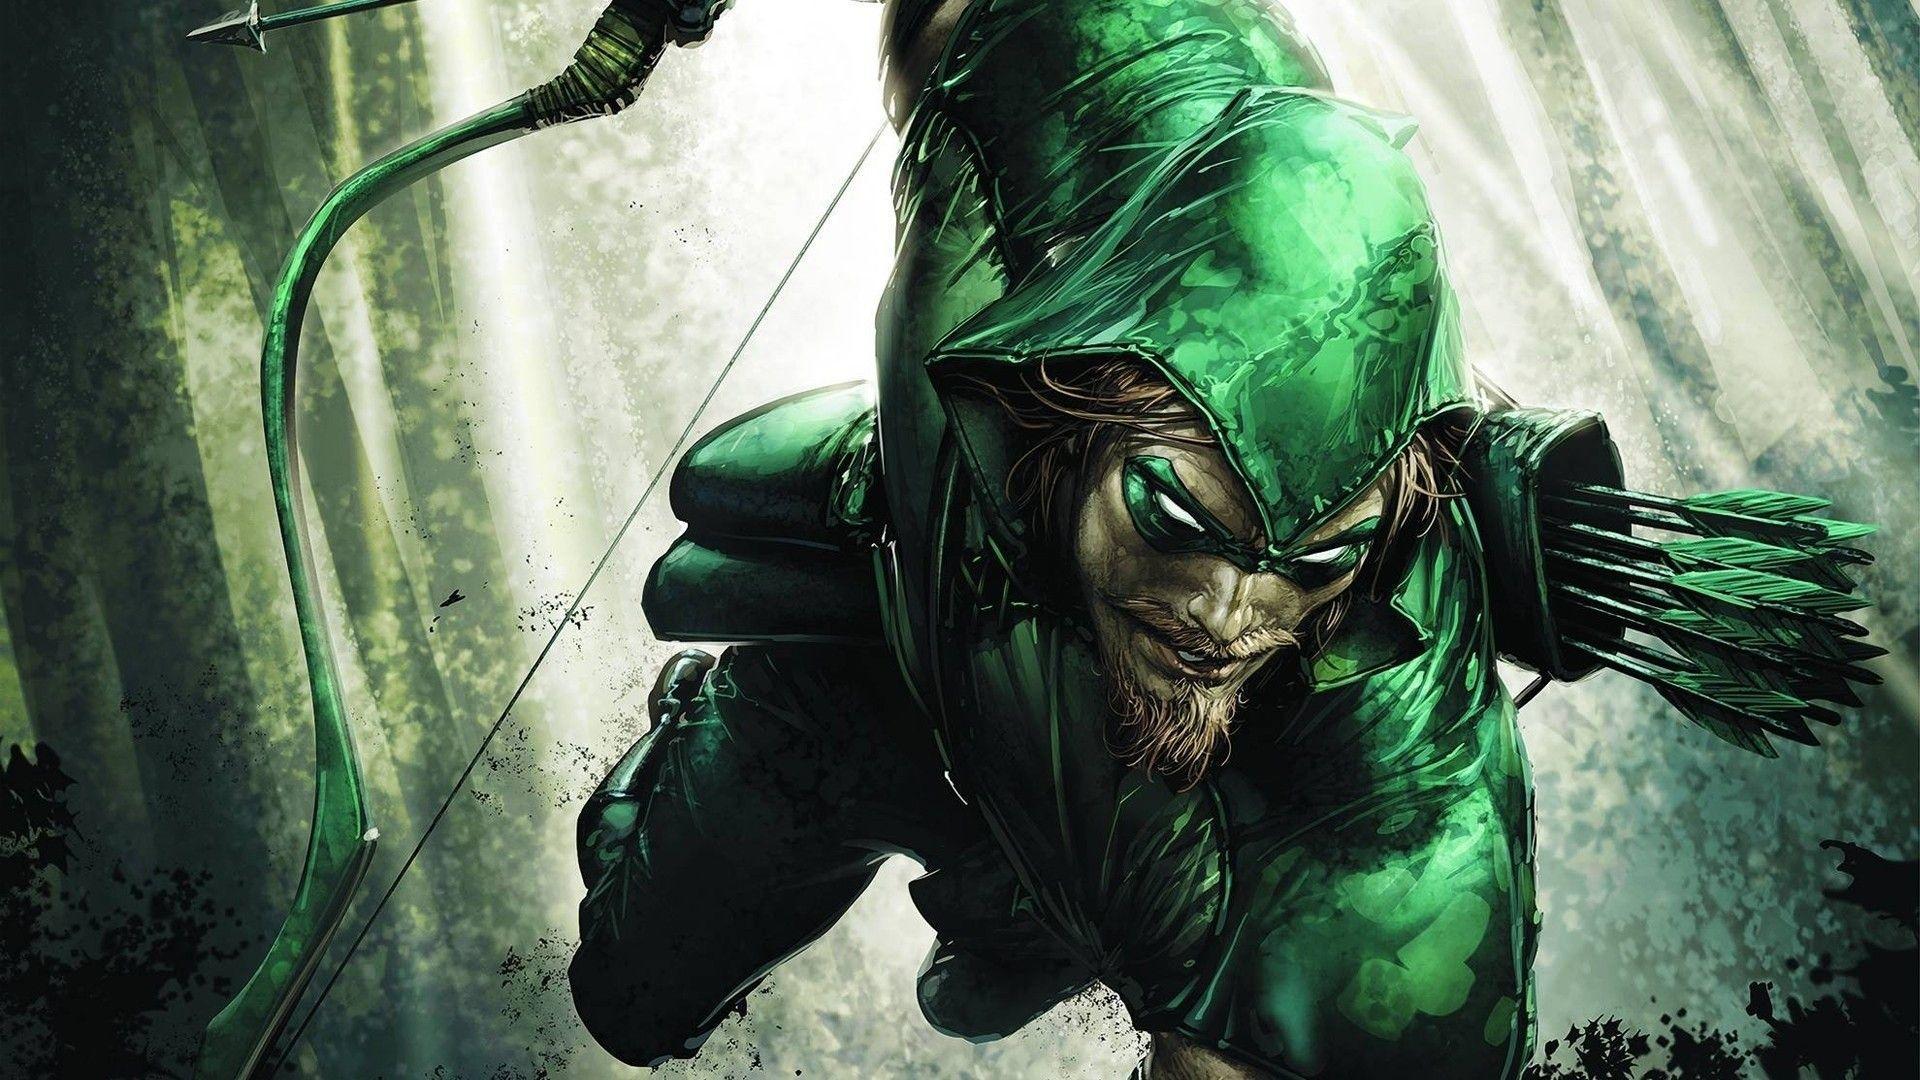 Green Arrow Wallpapers Top Free Green Arrow Backgrounds